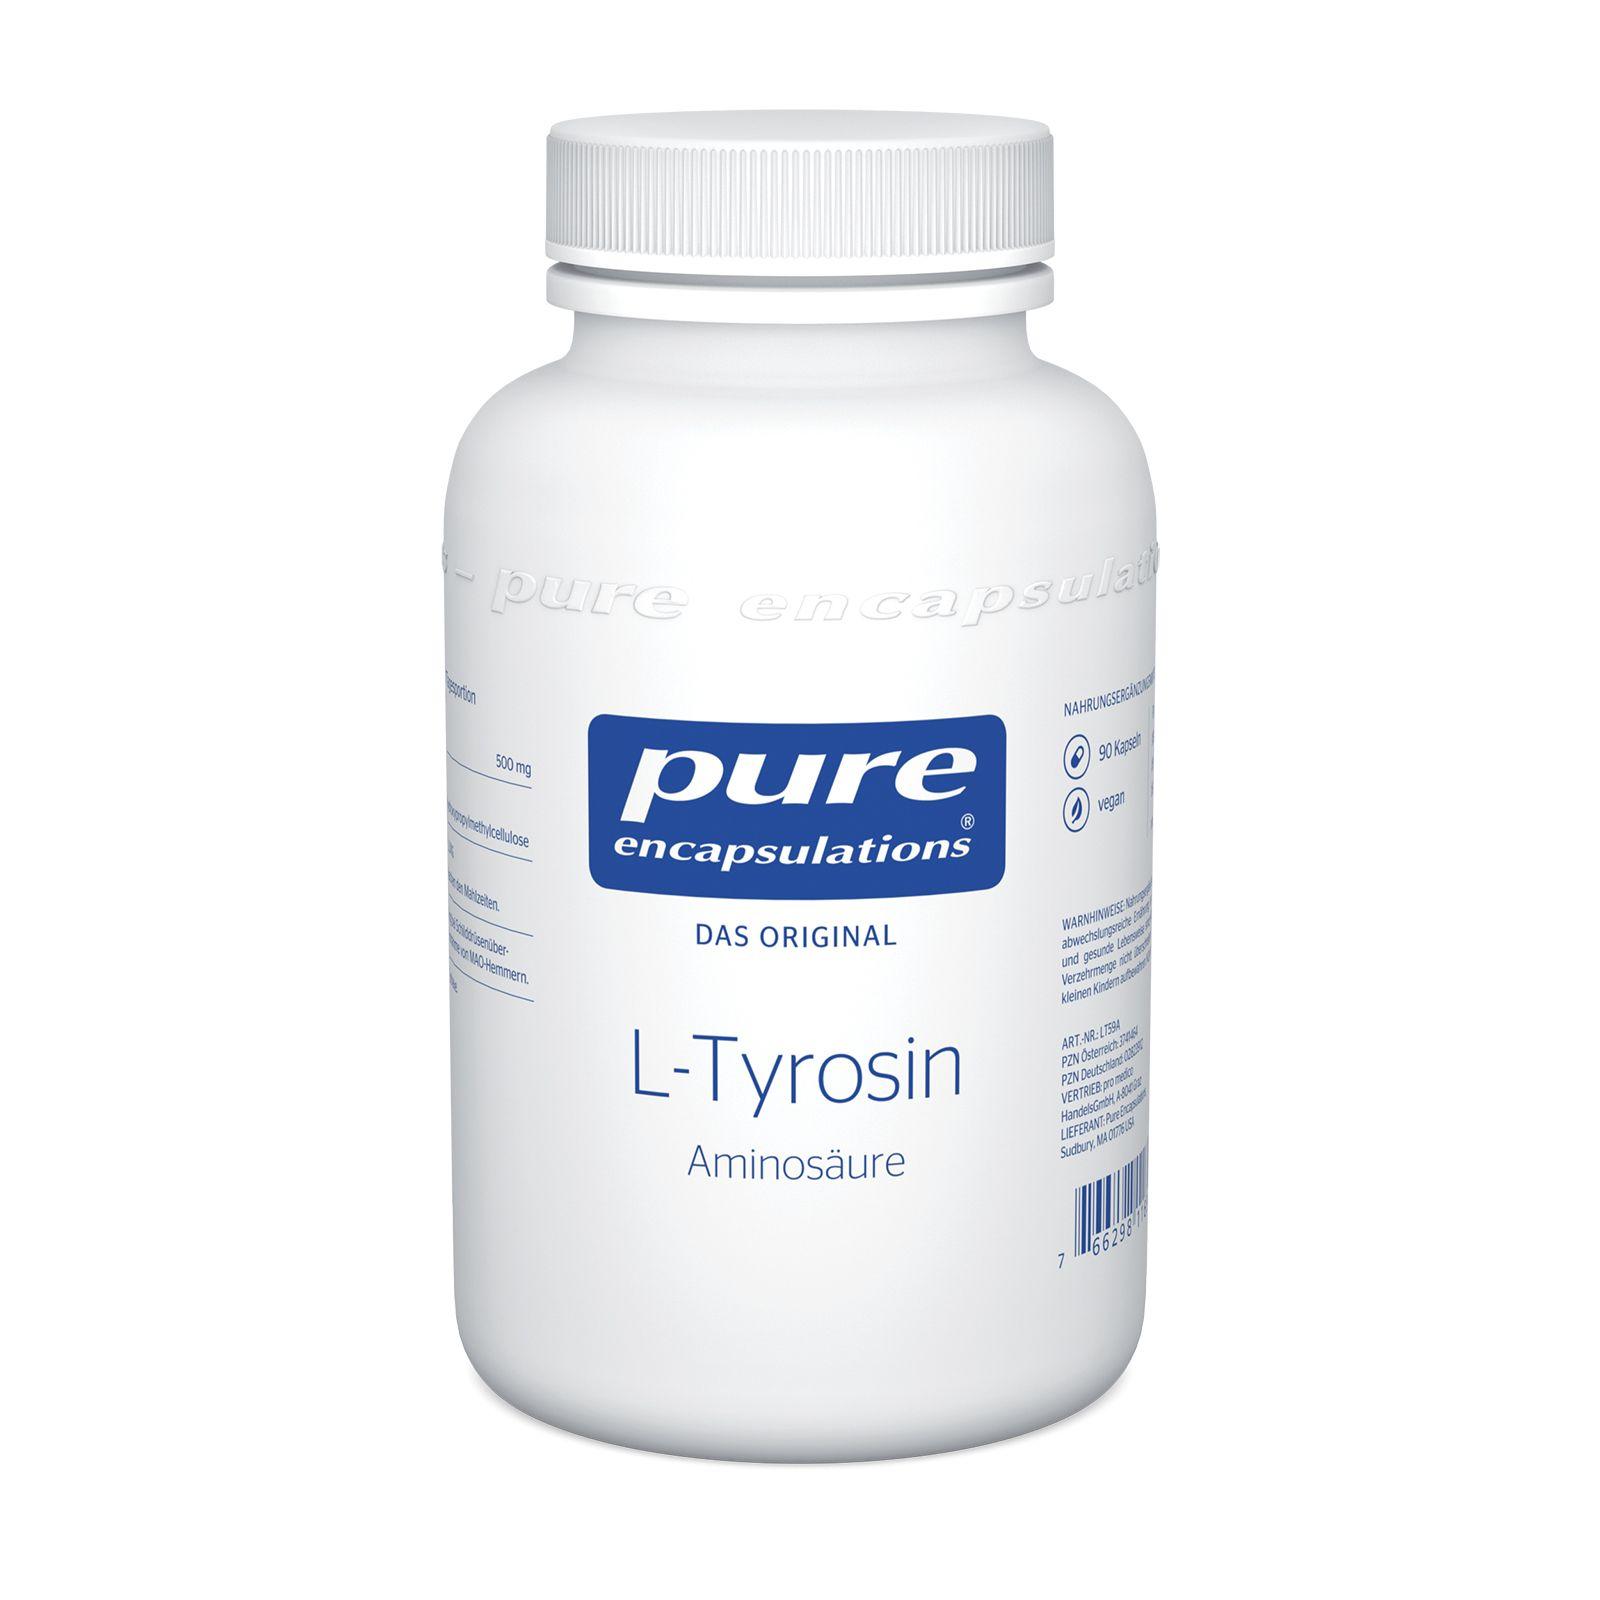 pure encapsulations® L-Tyrosin